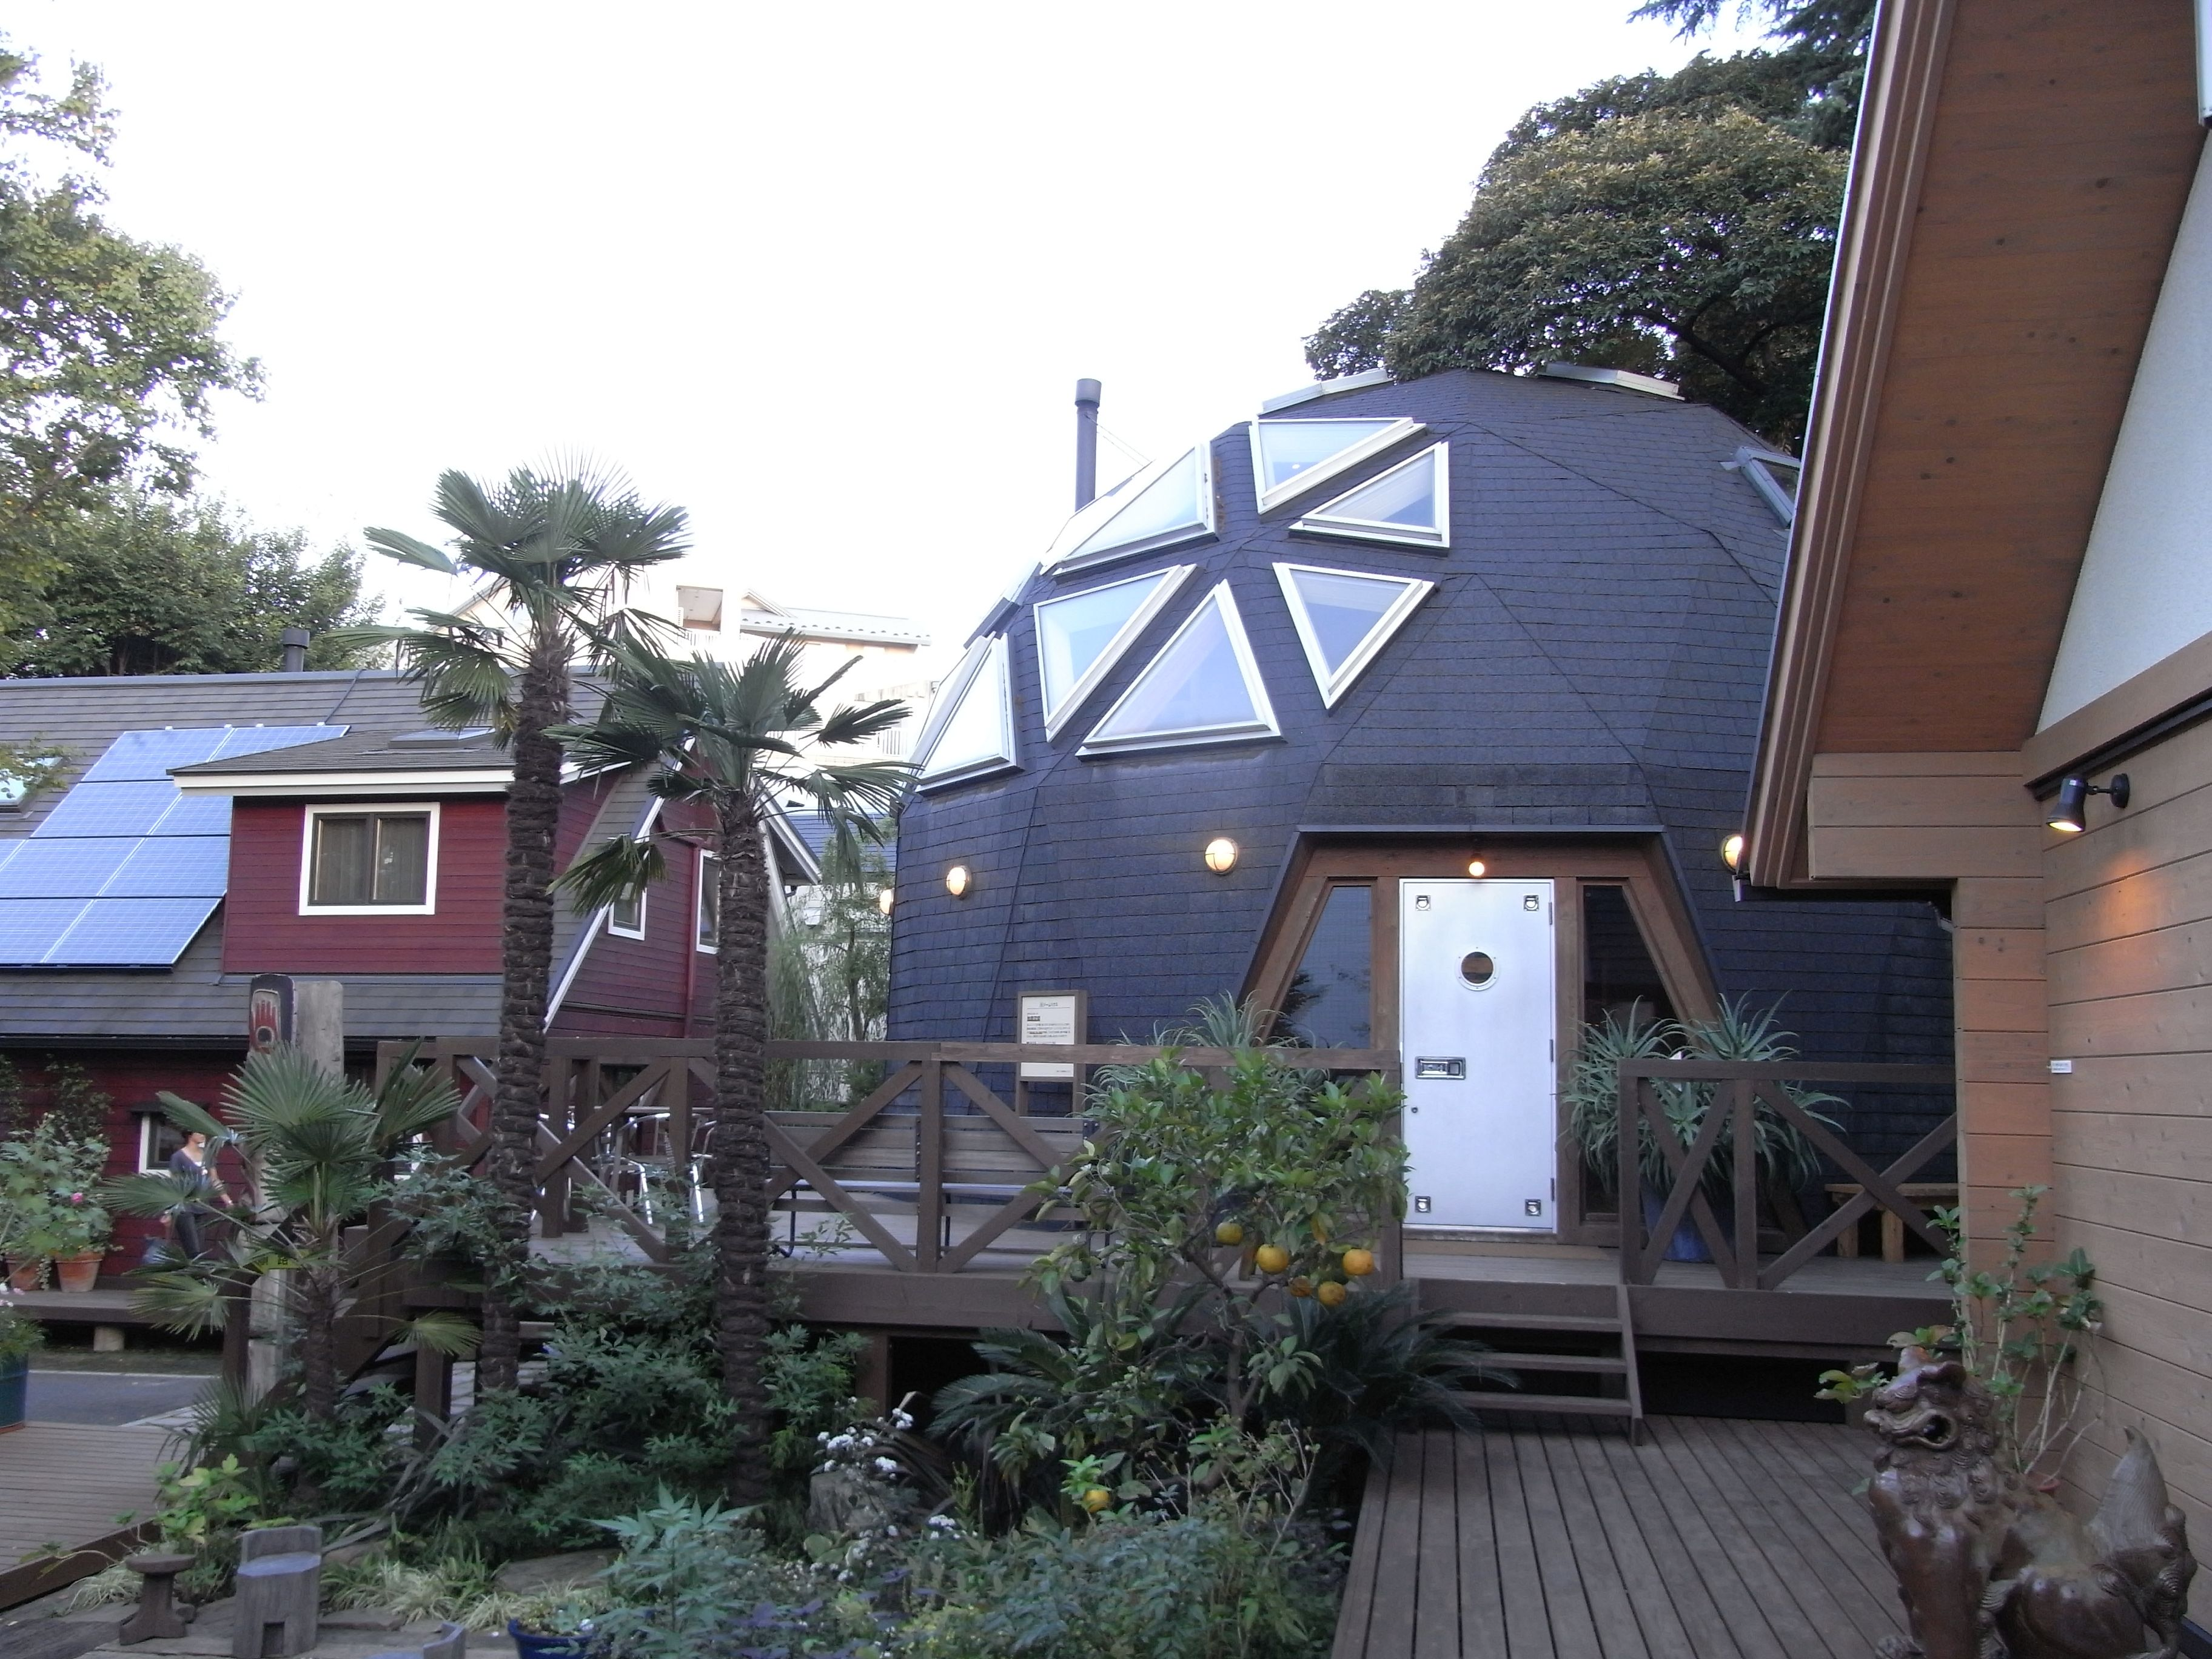 The Hippie Houses Of The North Mountain Nova Scotia -